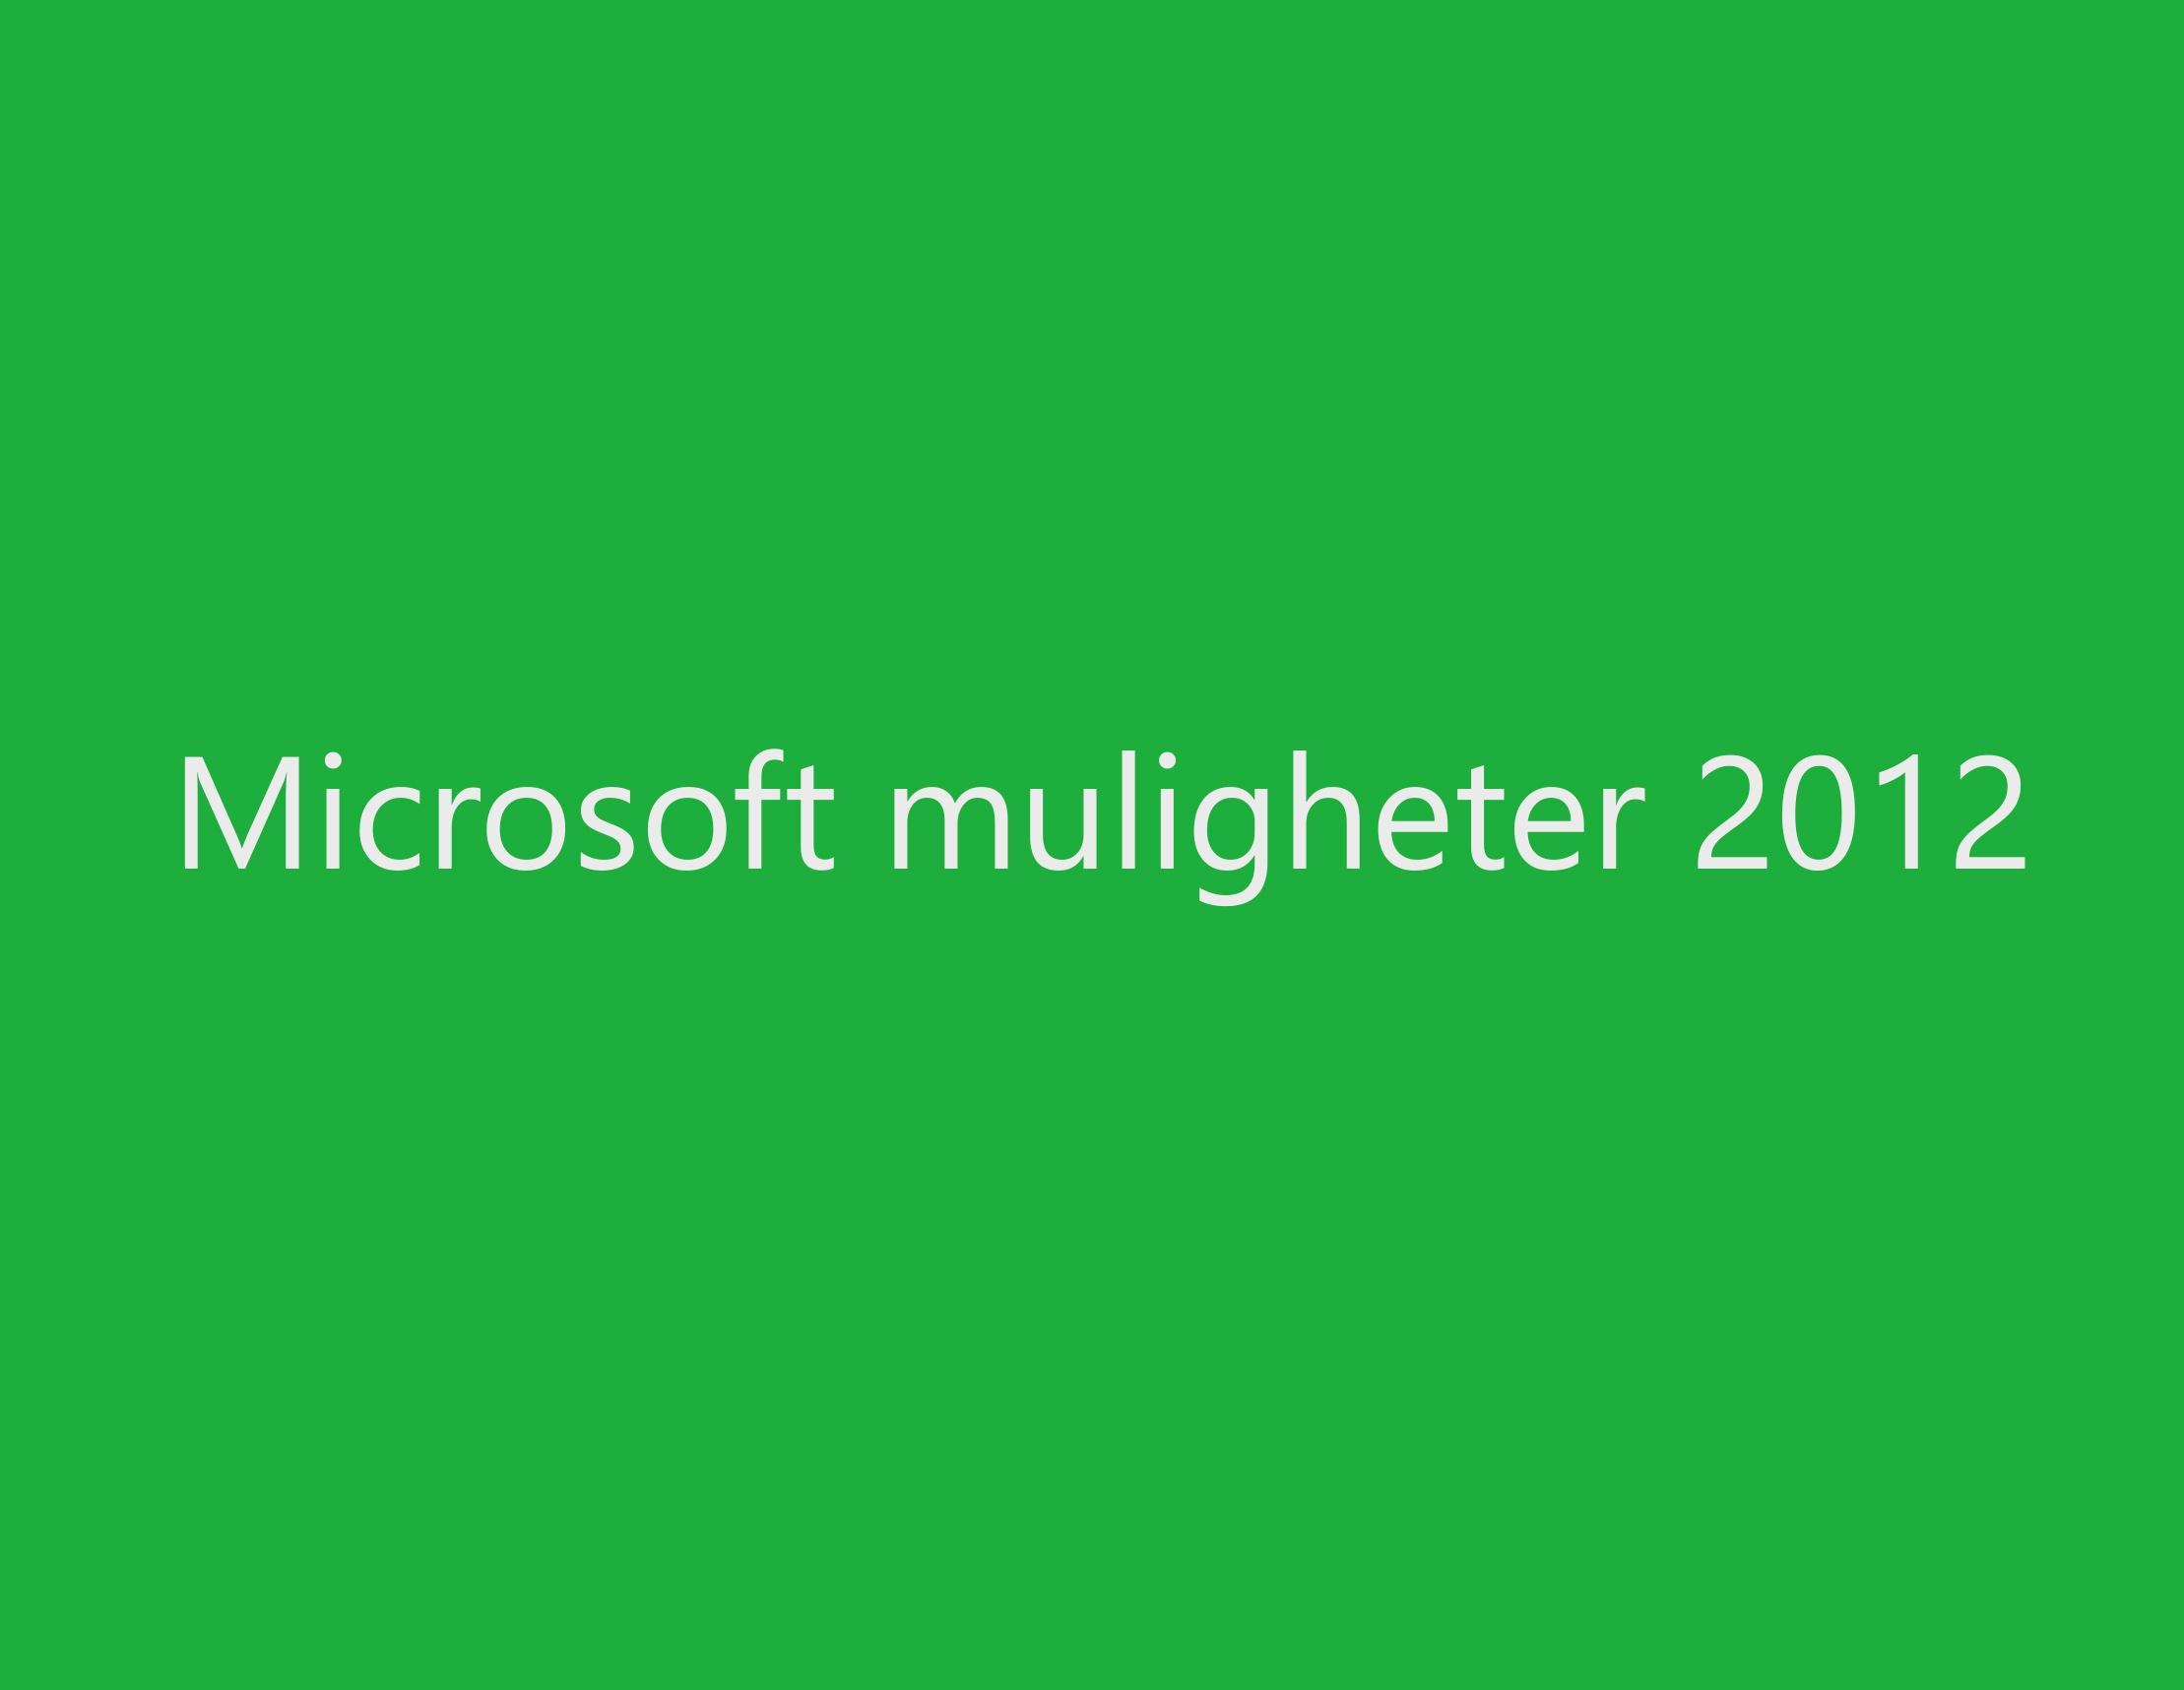 Microsoft Muligheter 2012